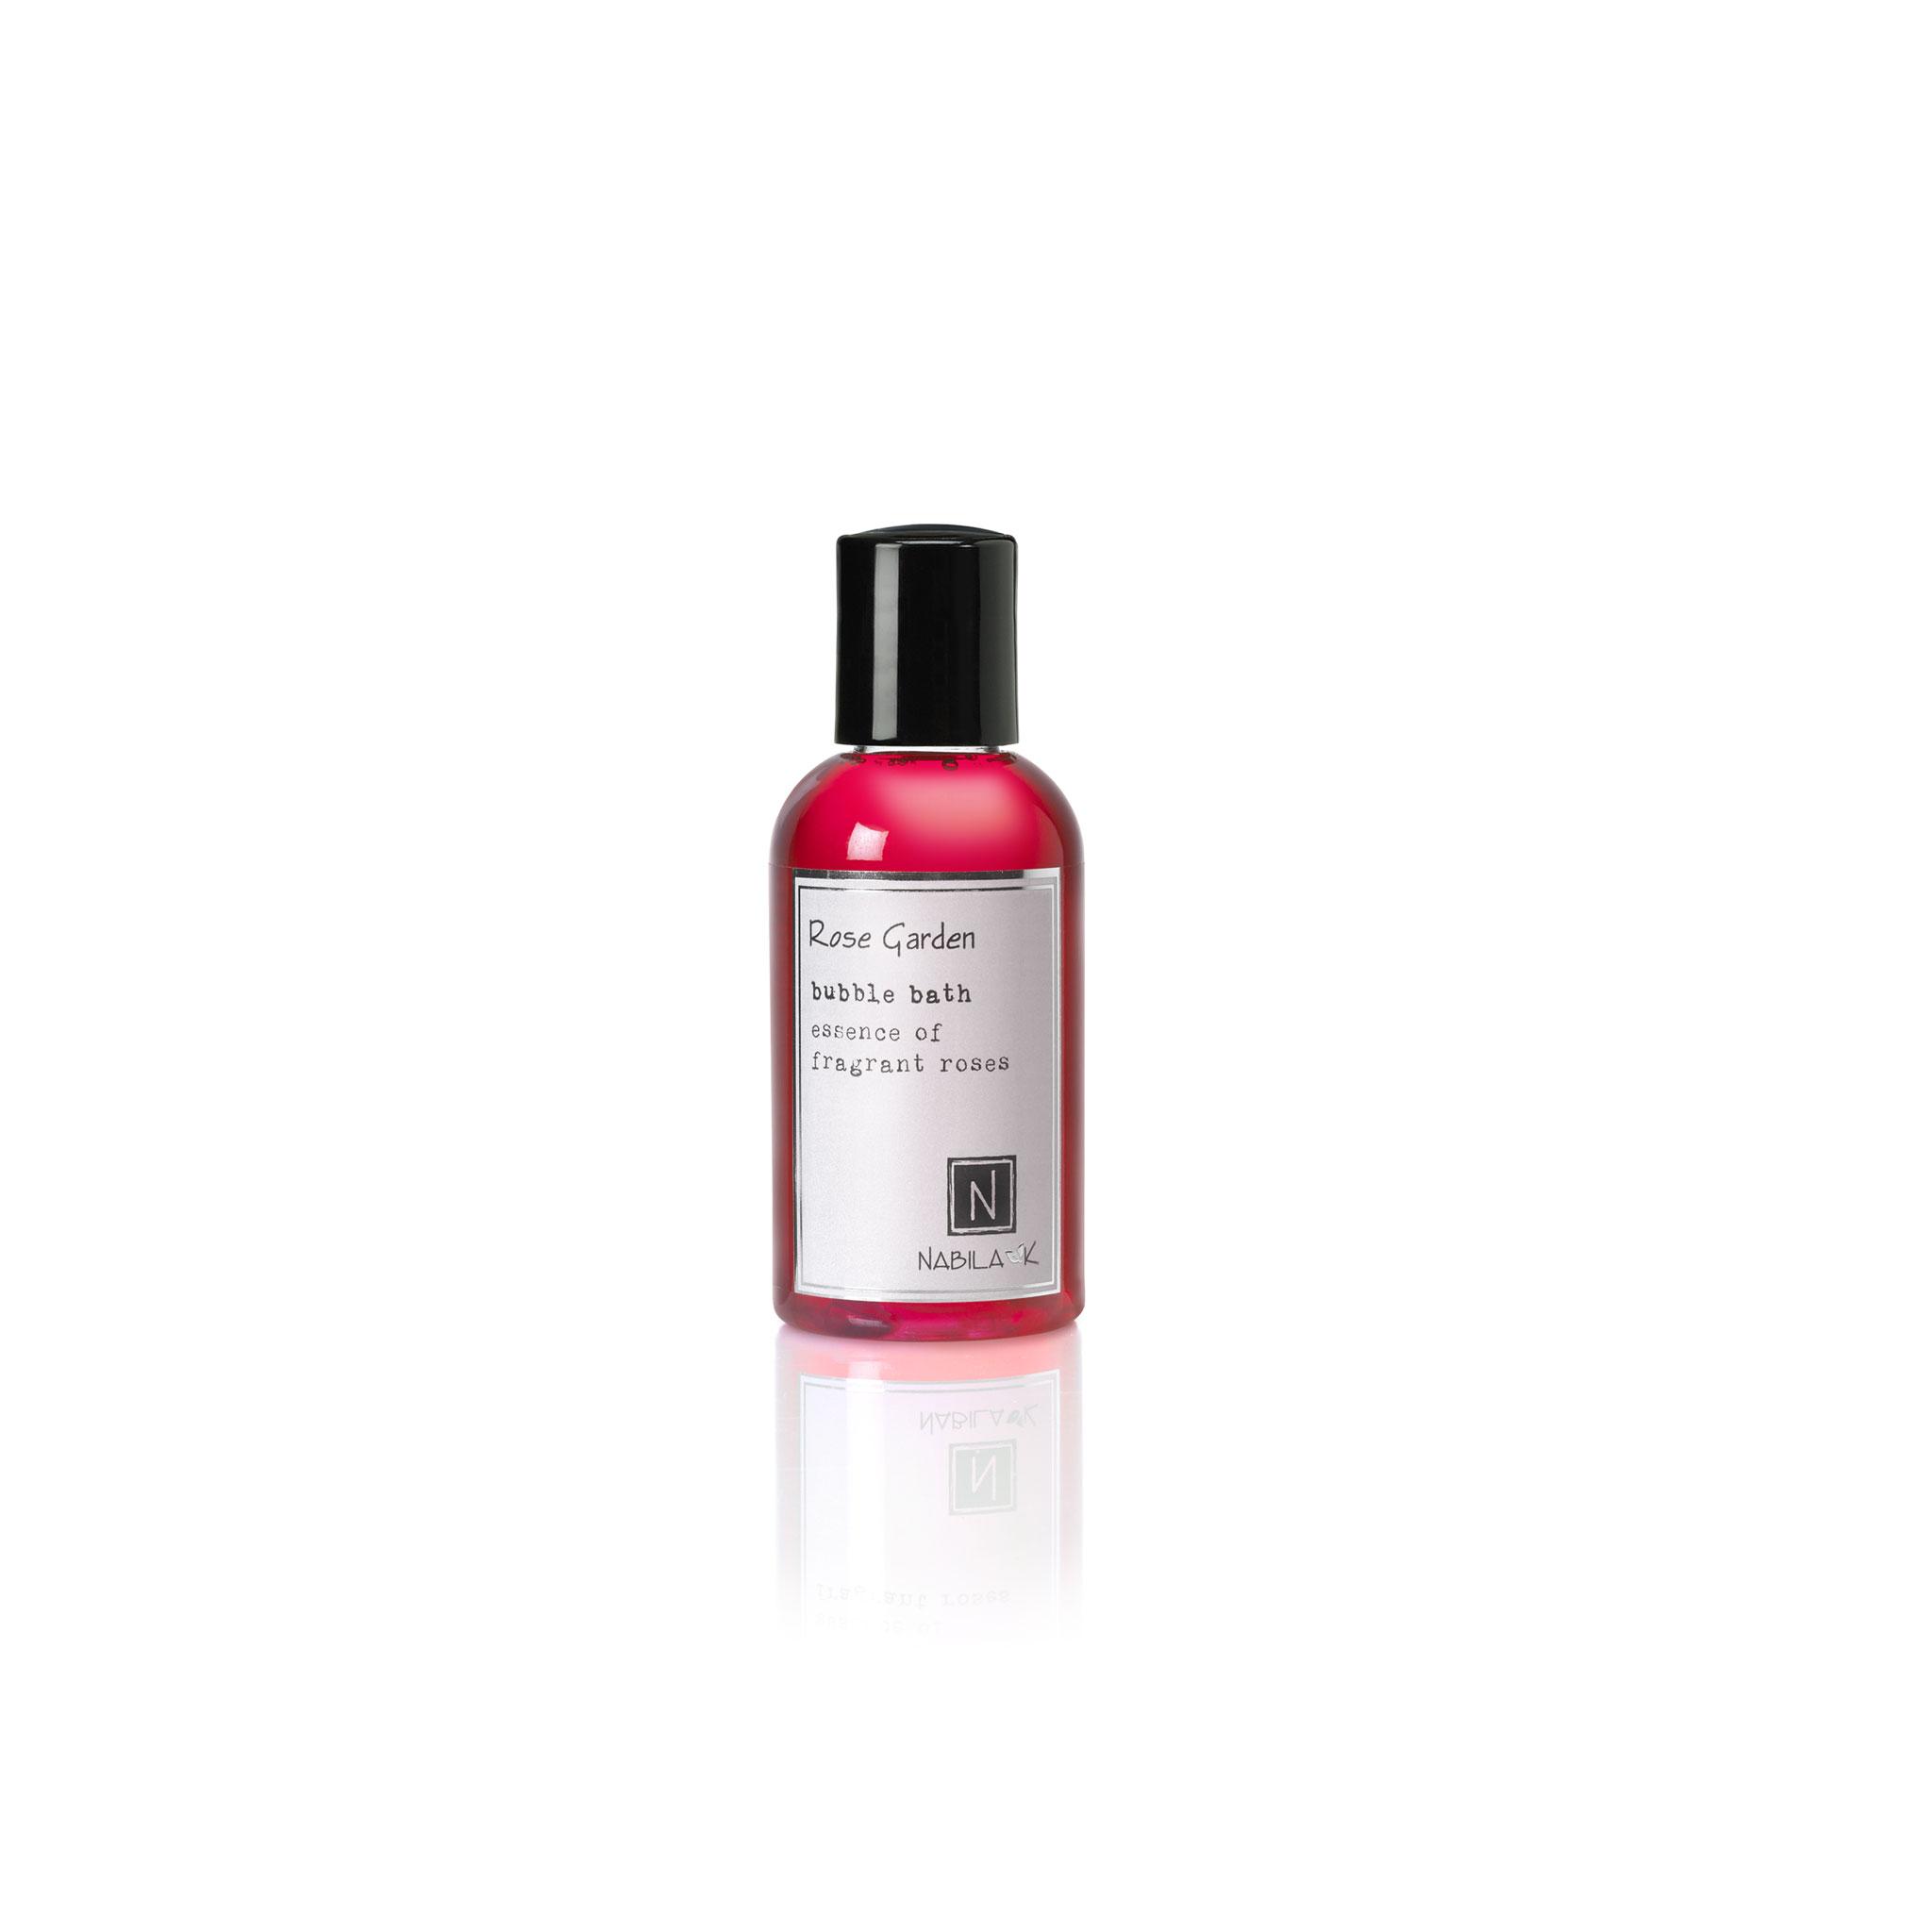 1 2oz bottle of rose garden bubble bath essence of fragrant roses